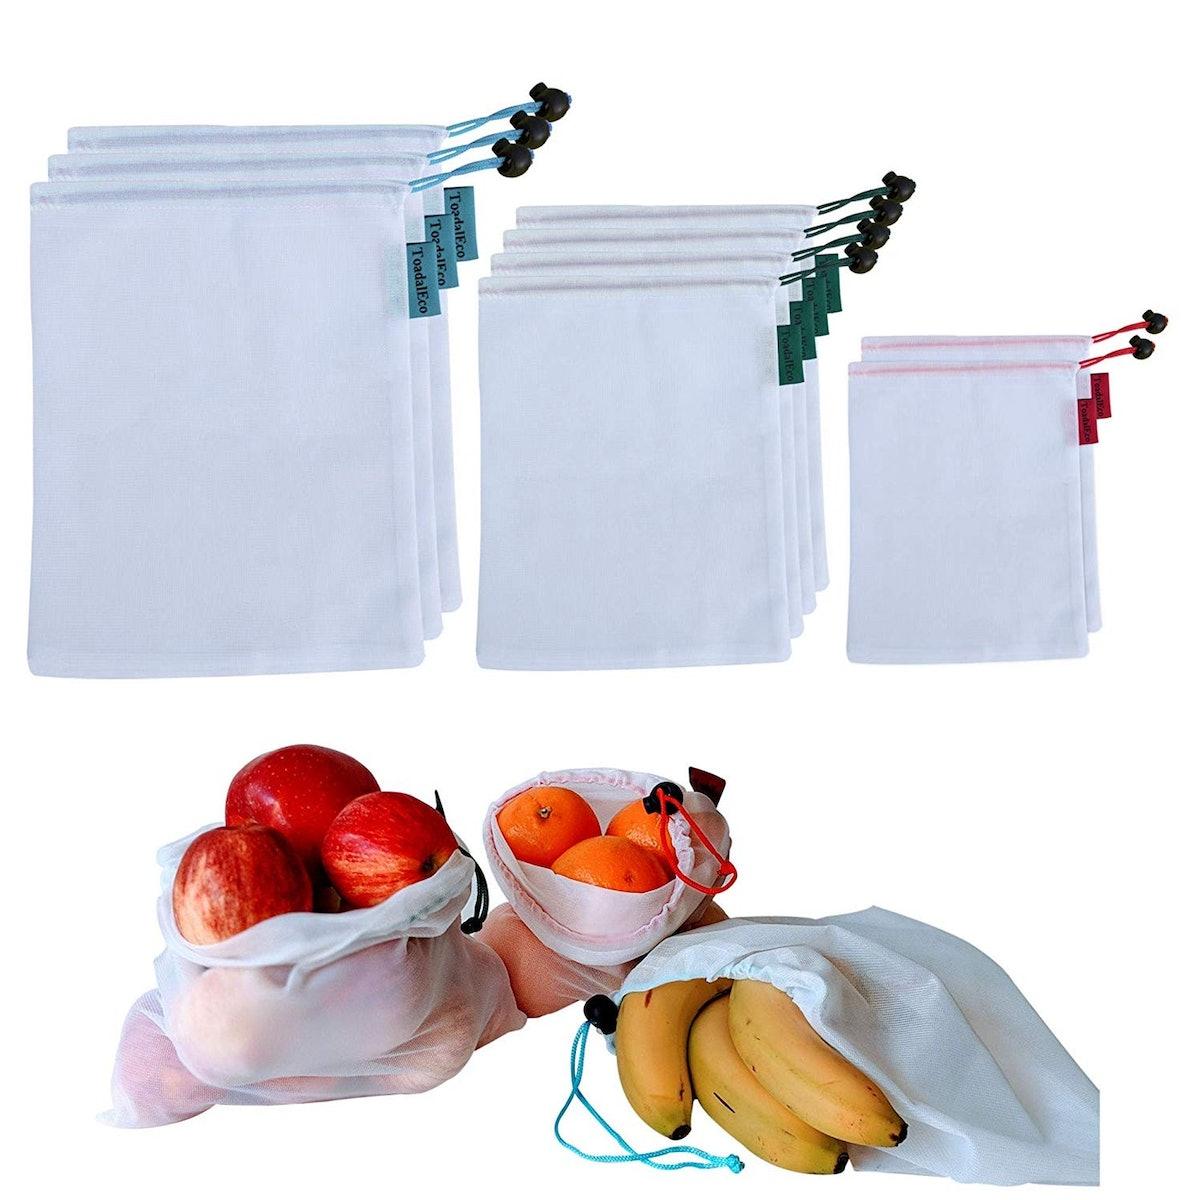 Toadal Eco Reusable Produce Bags (9-Piece Set)